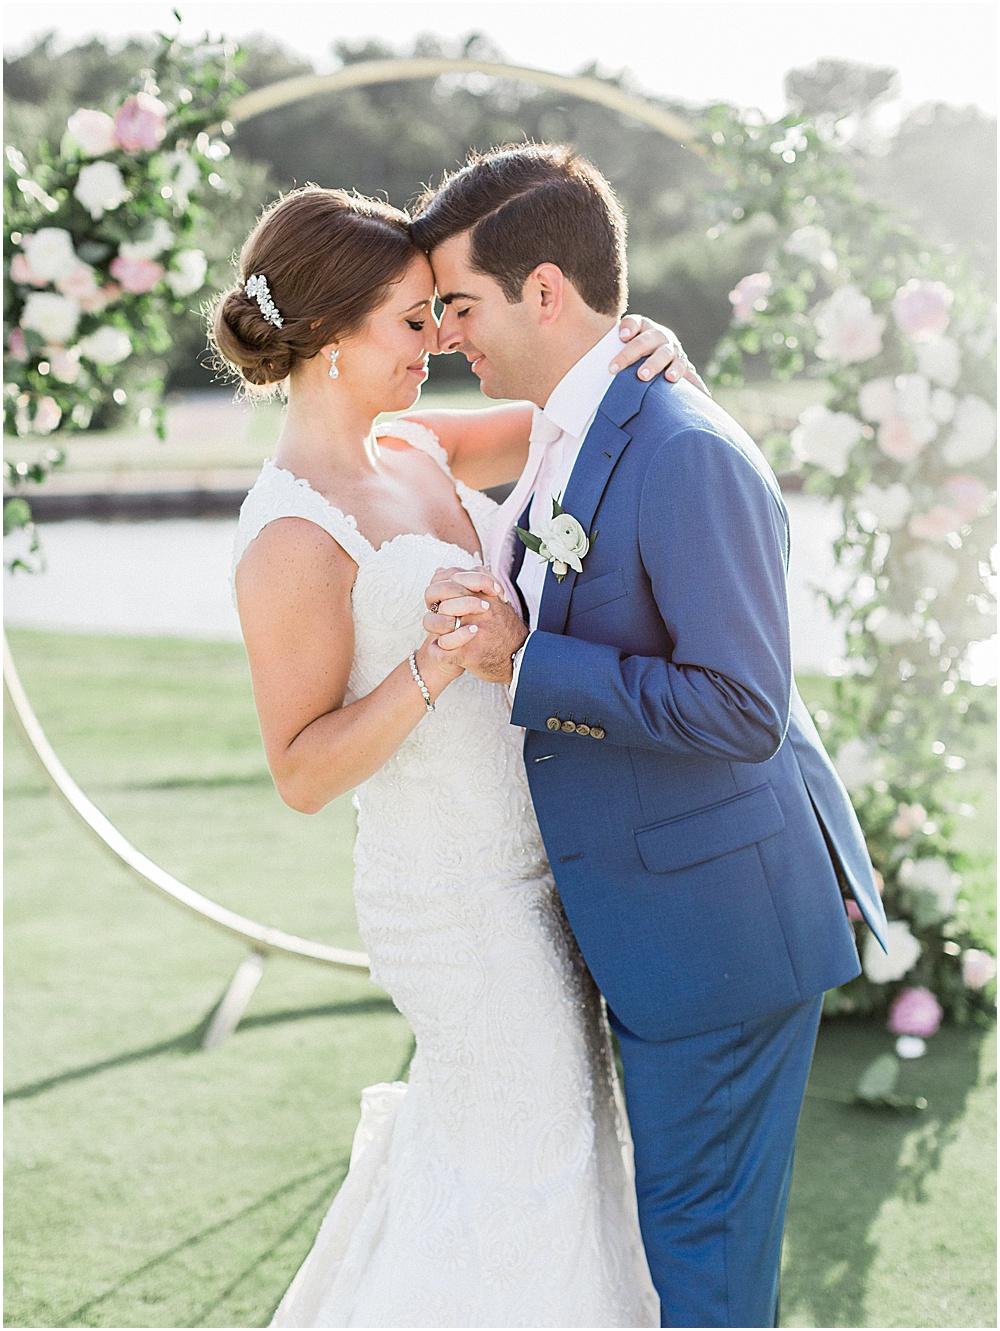 willowbend_country_club_colleen_brett_wild_dahlia_cw_events_cape_cod_massachusetts_boston_wedding_photographer_meredith_jane_photography_photo_0599.jpg